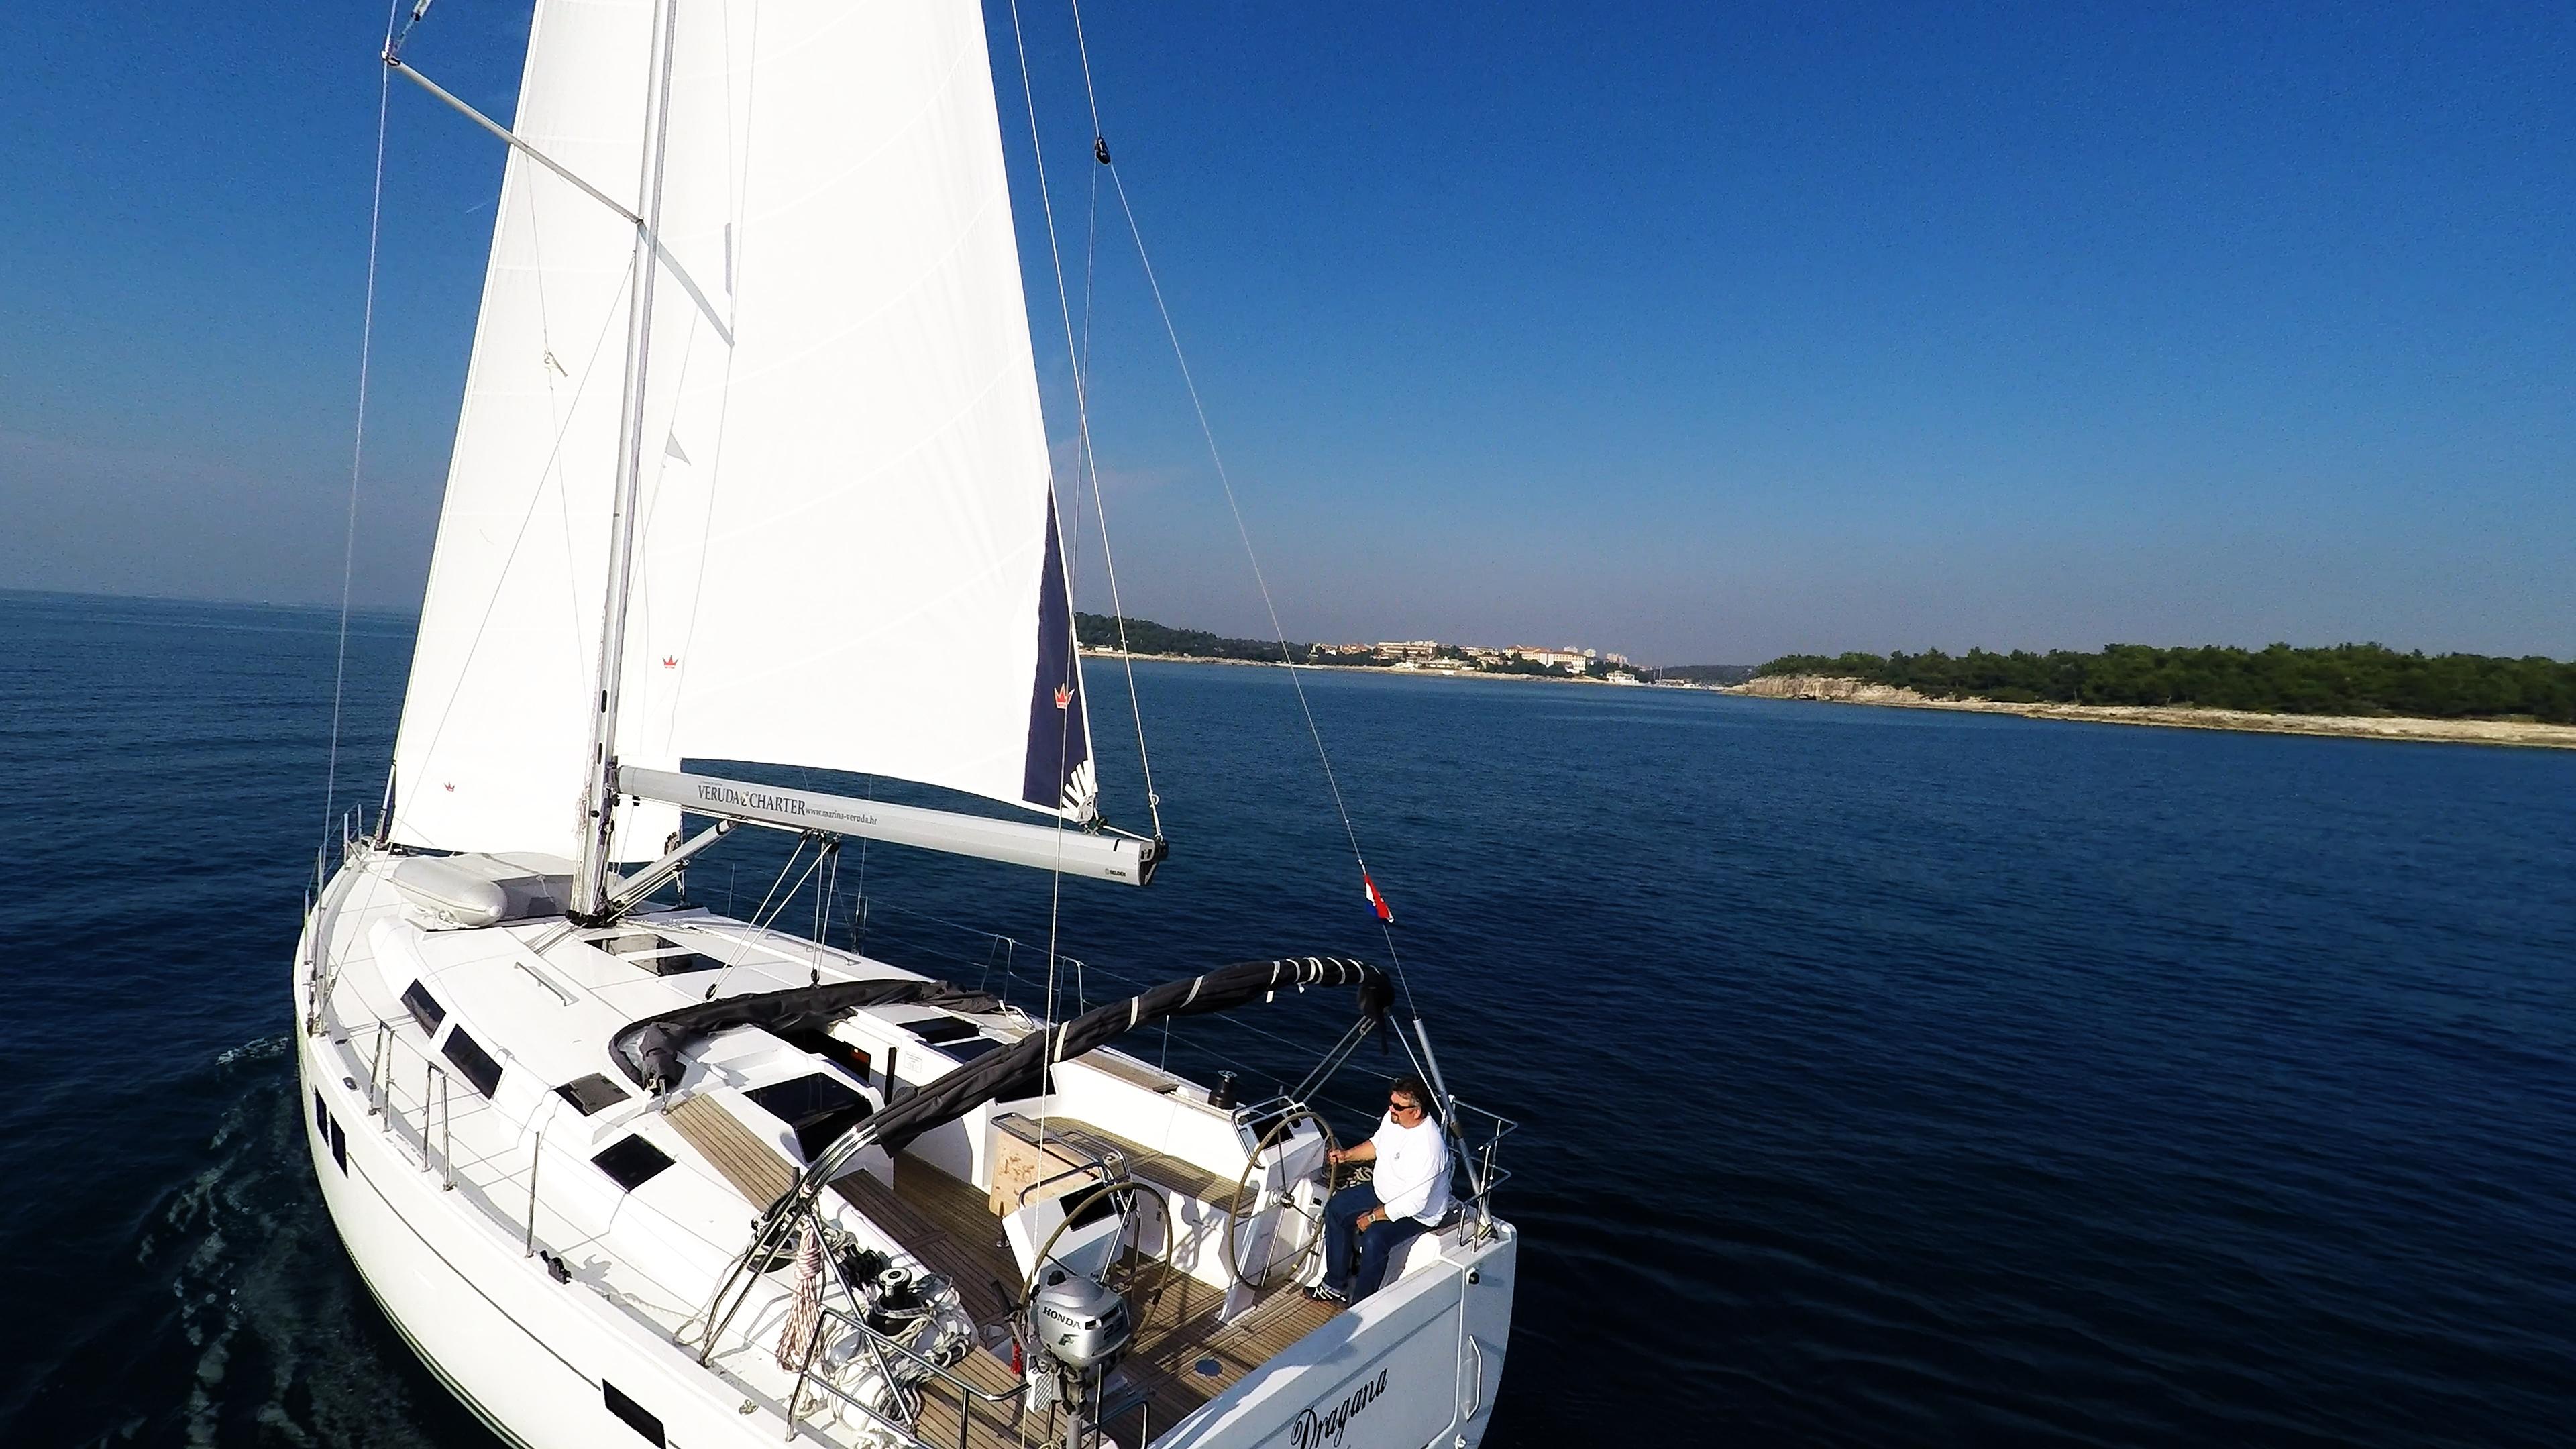 barcha a vela yacht a vela Hanse 505 vele pozzetto timone mare